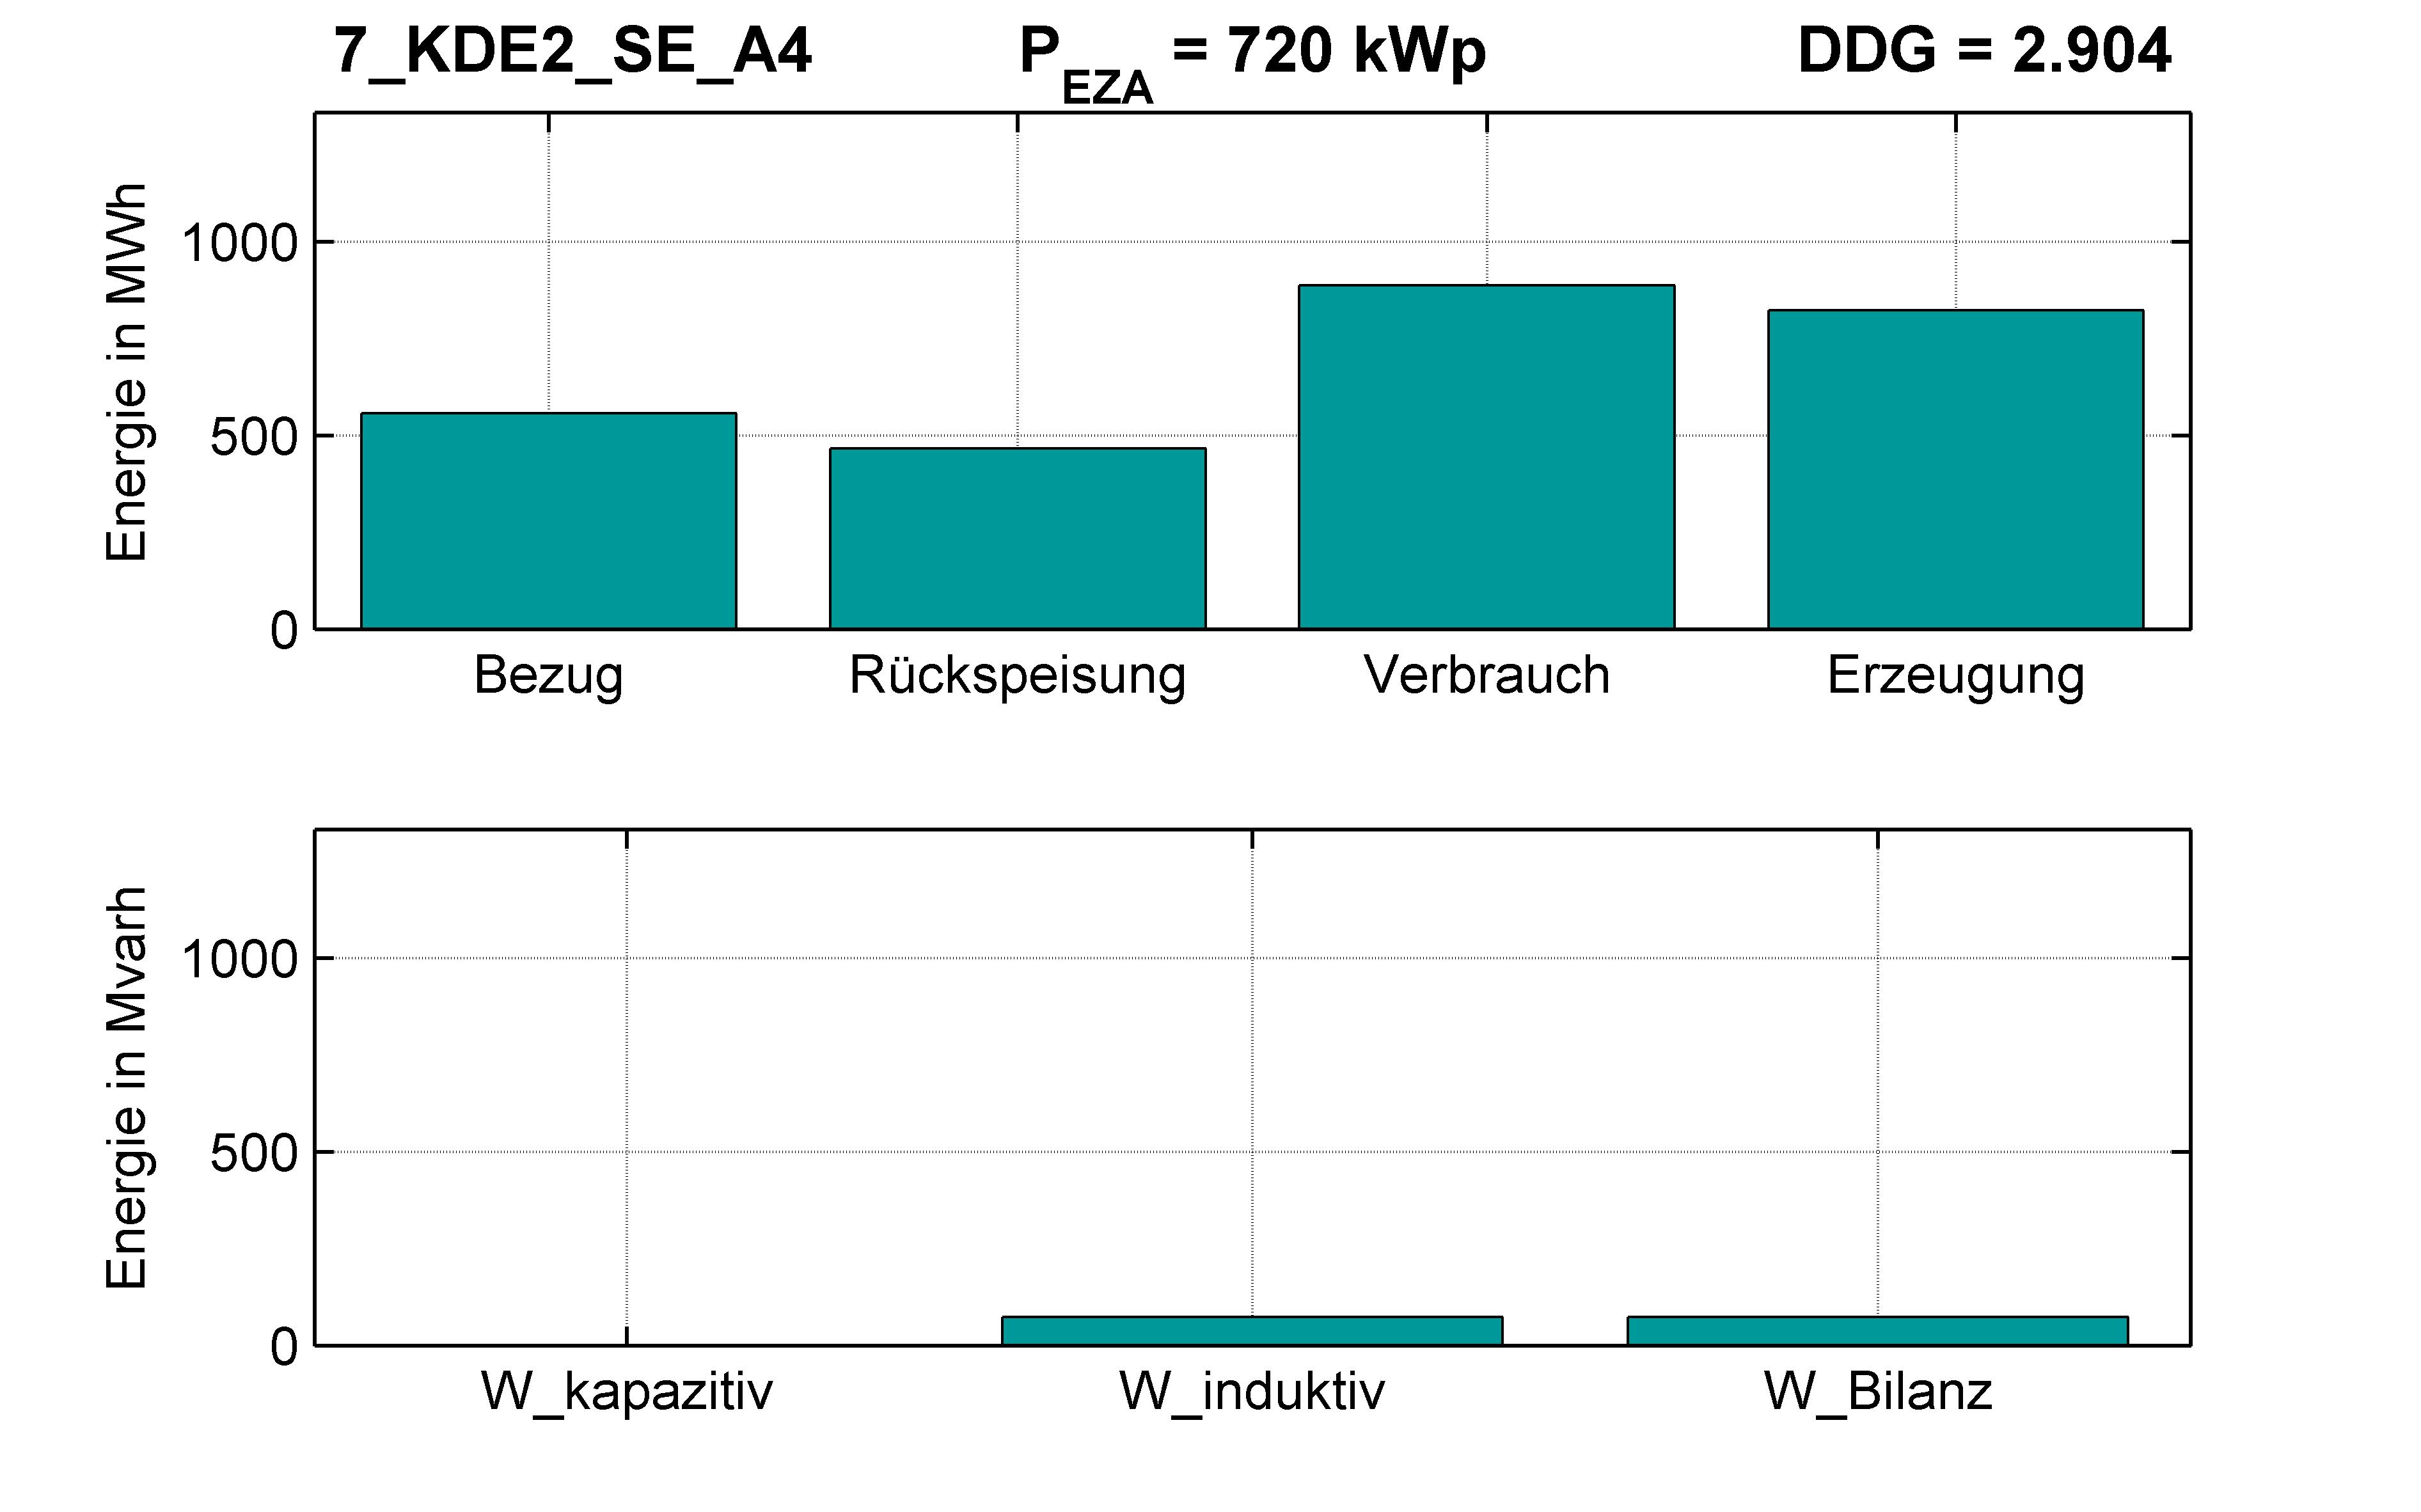 KDE2 | Längsregler (SE) A4 | PQ-Bilanz